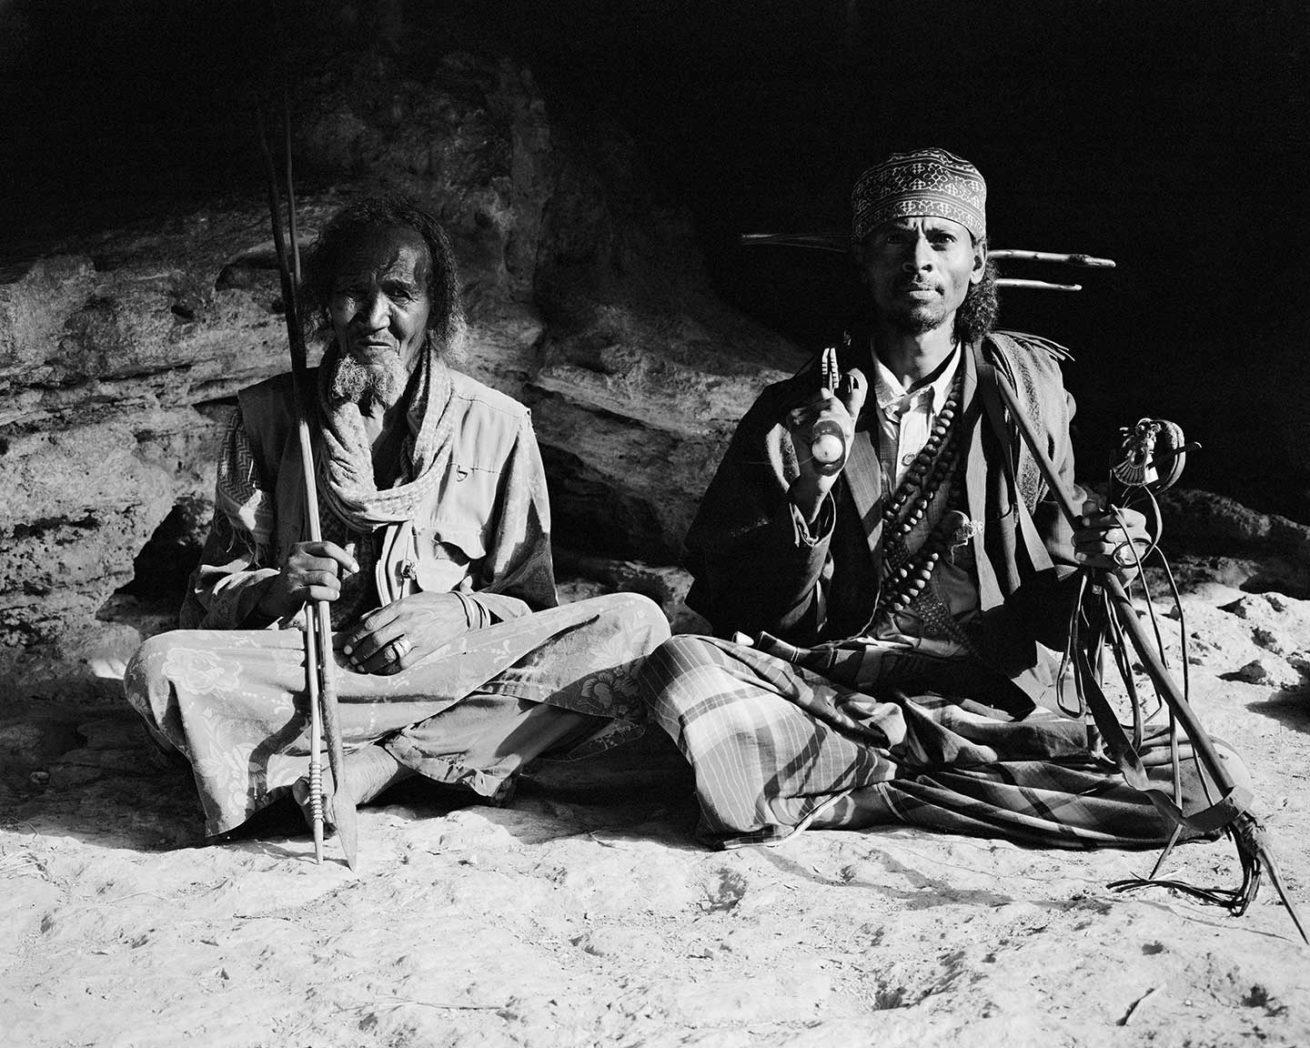 "Dire Sheikh Hussein: Sheikh Faisal & Tunaa Adyo inside Anagenyi cave. 4x5"" Black & White Film"